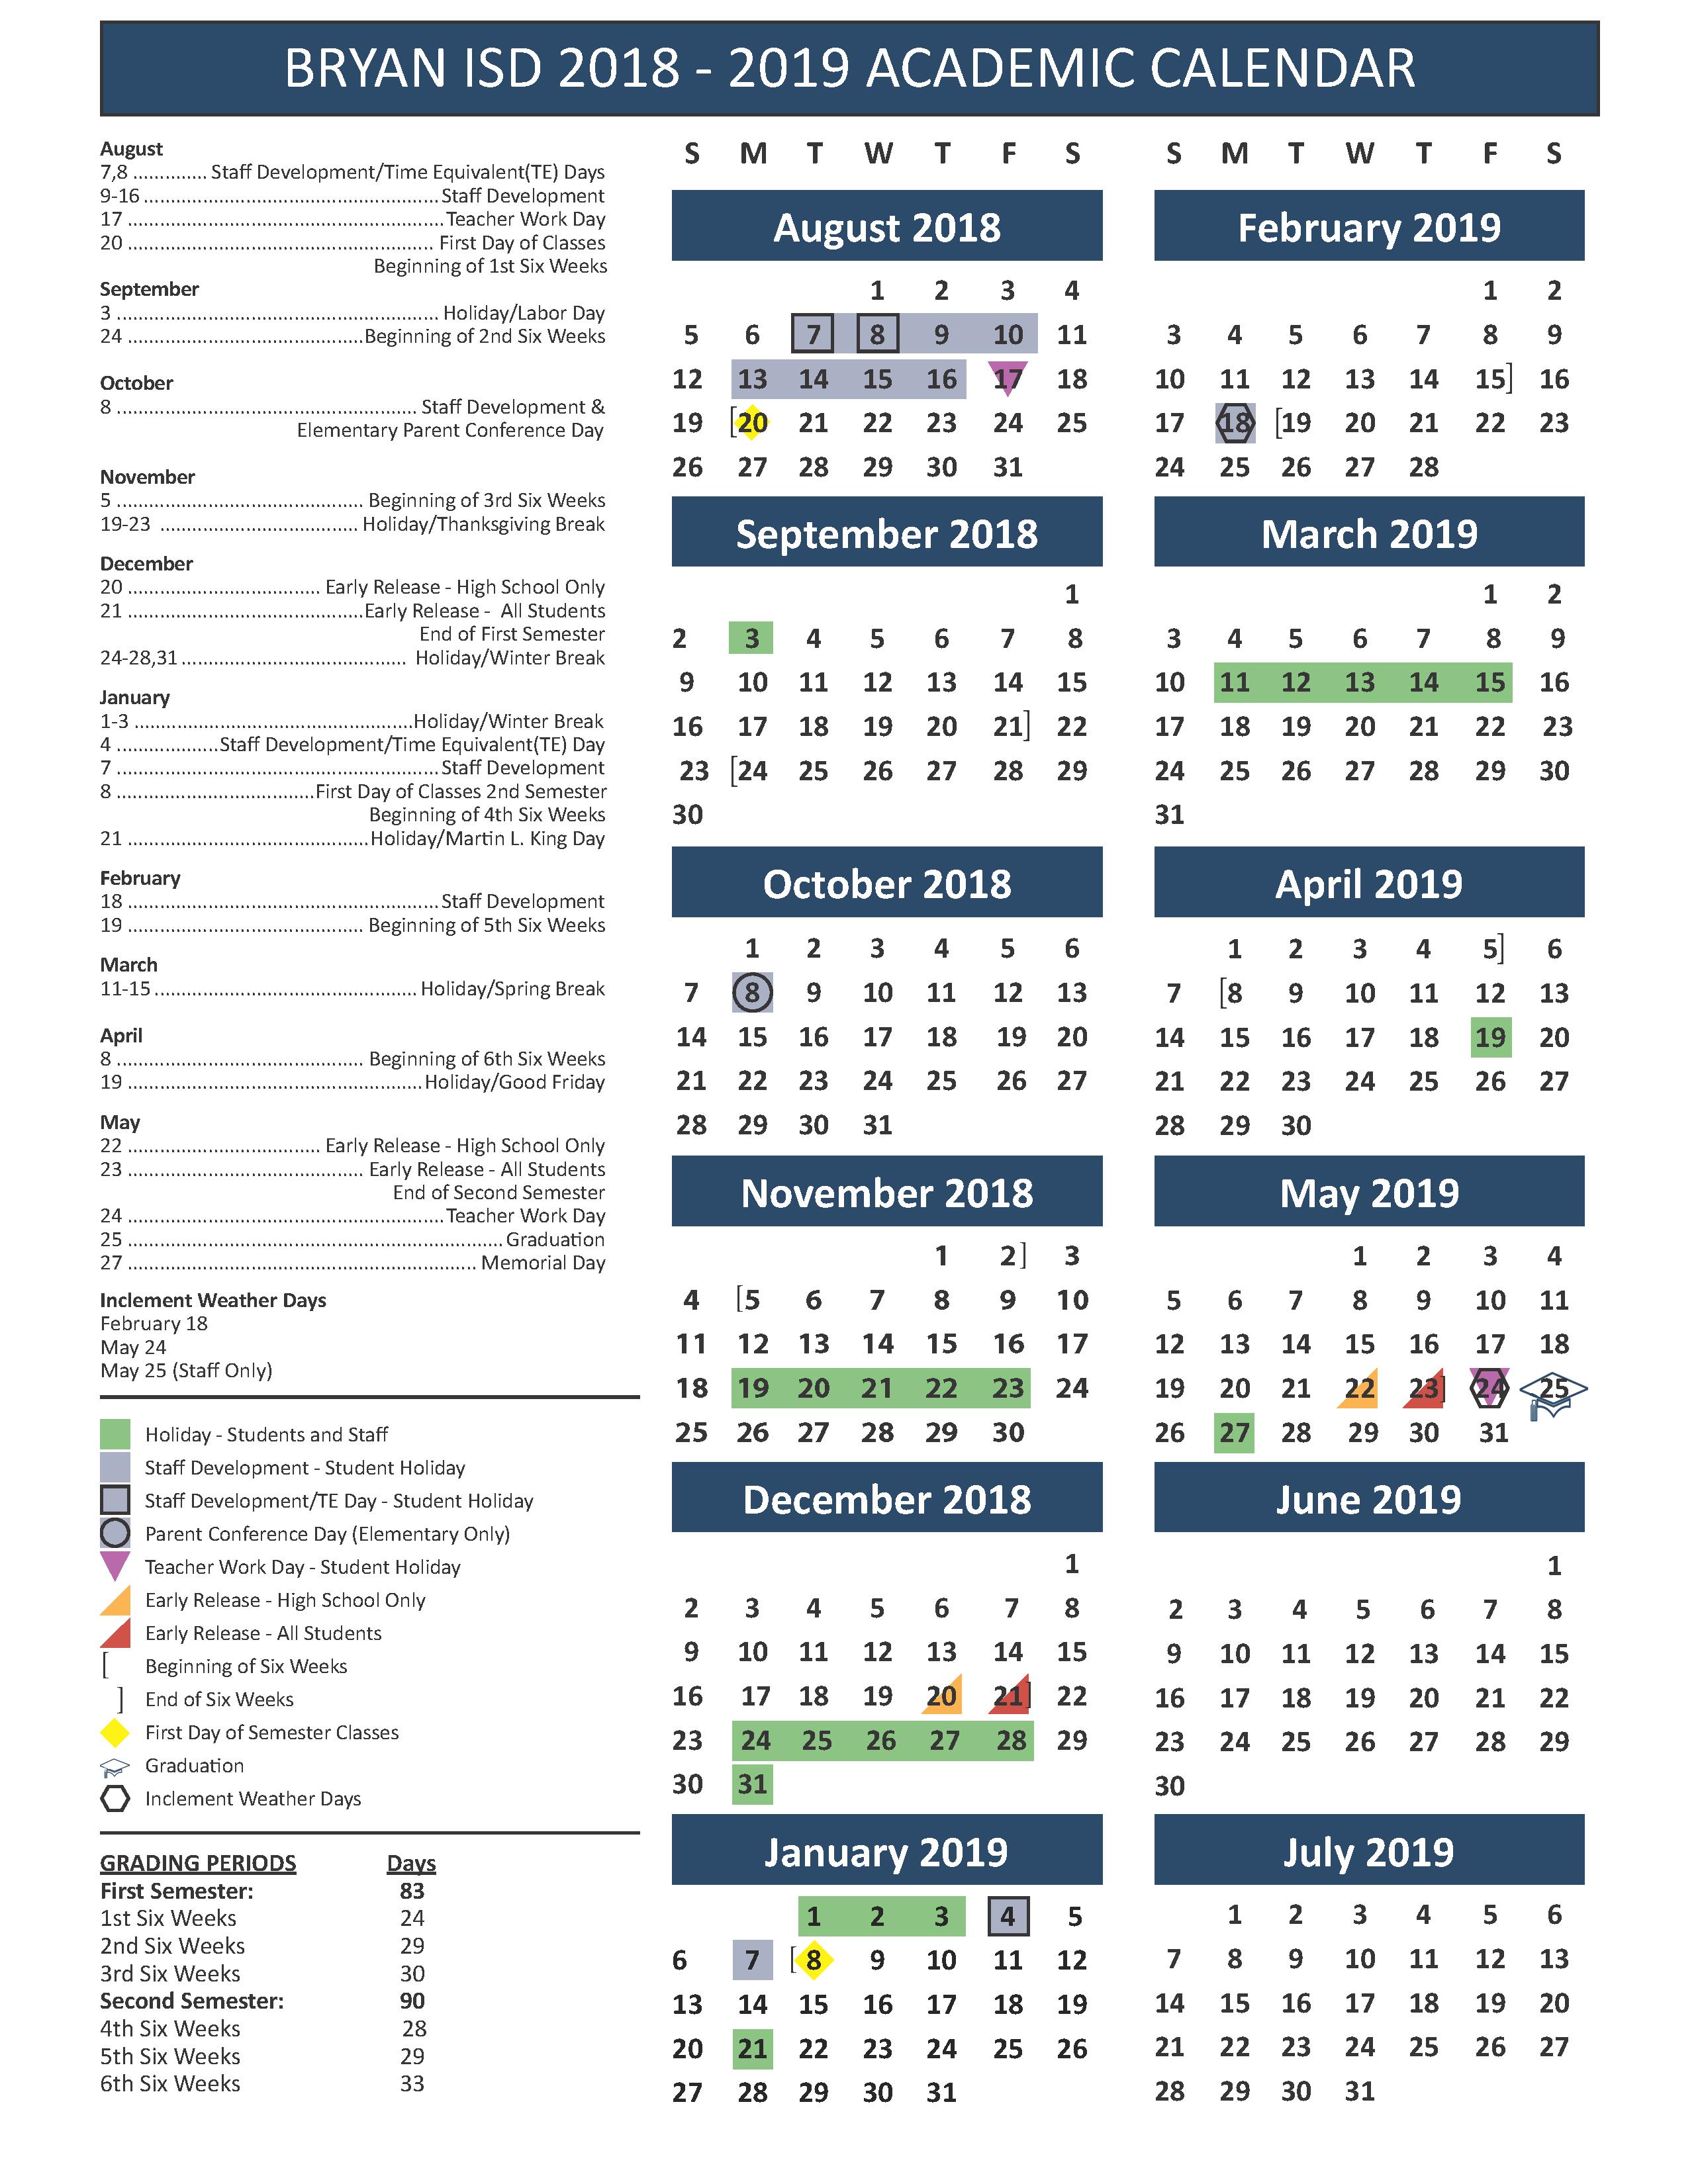 School Calendar Testing Fine Arts Athletics Events